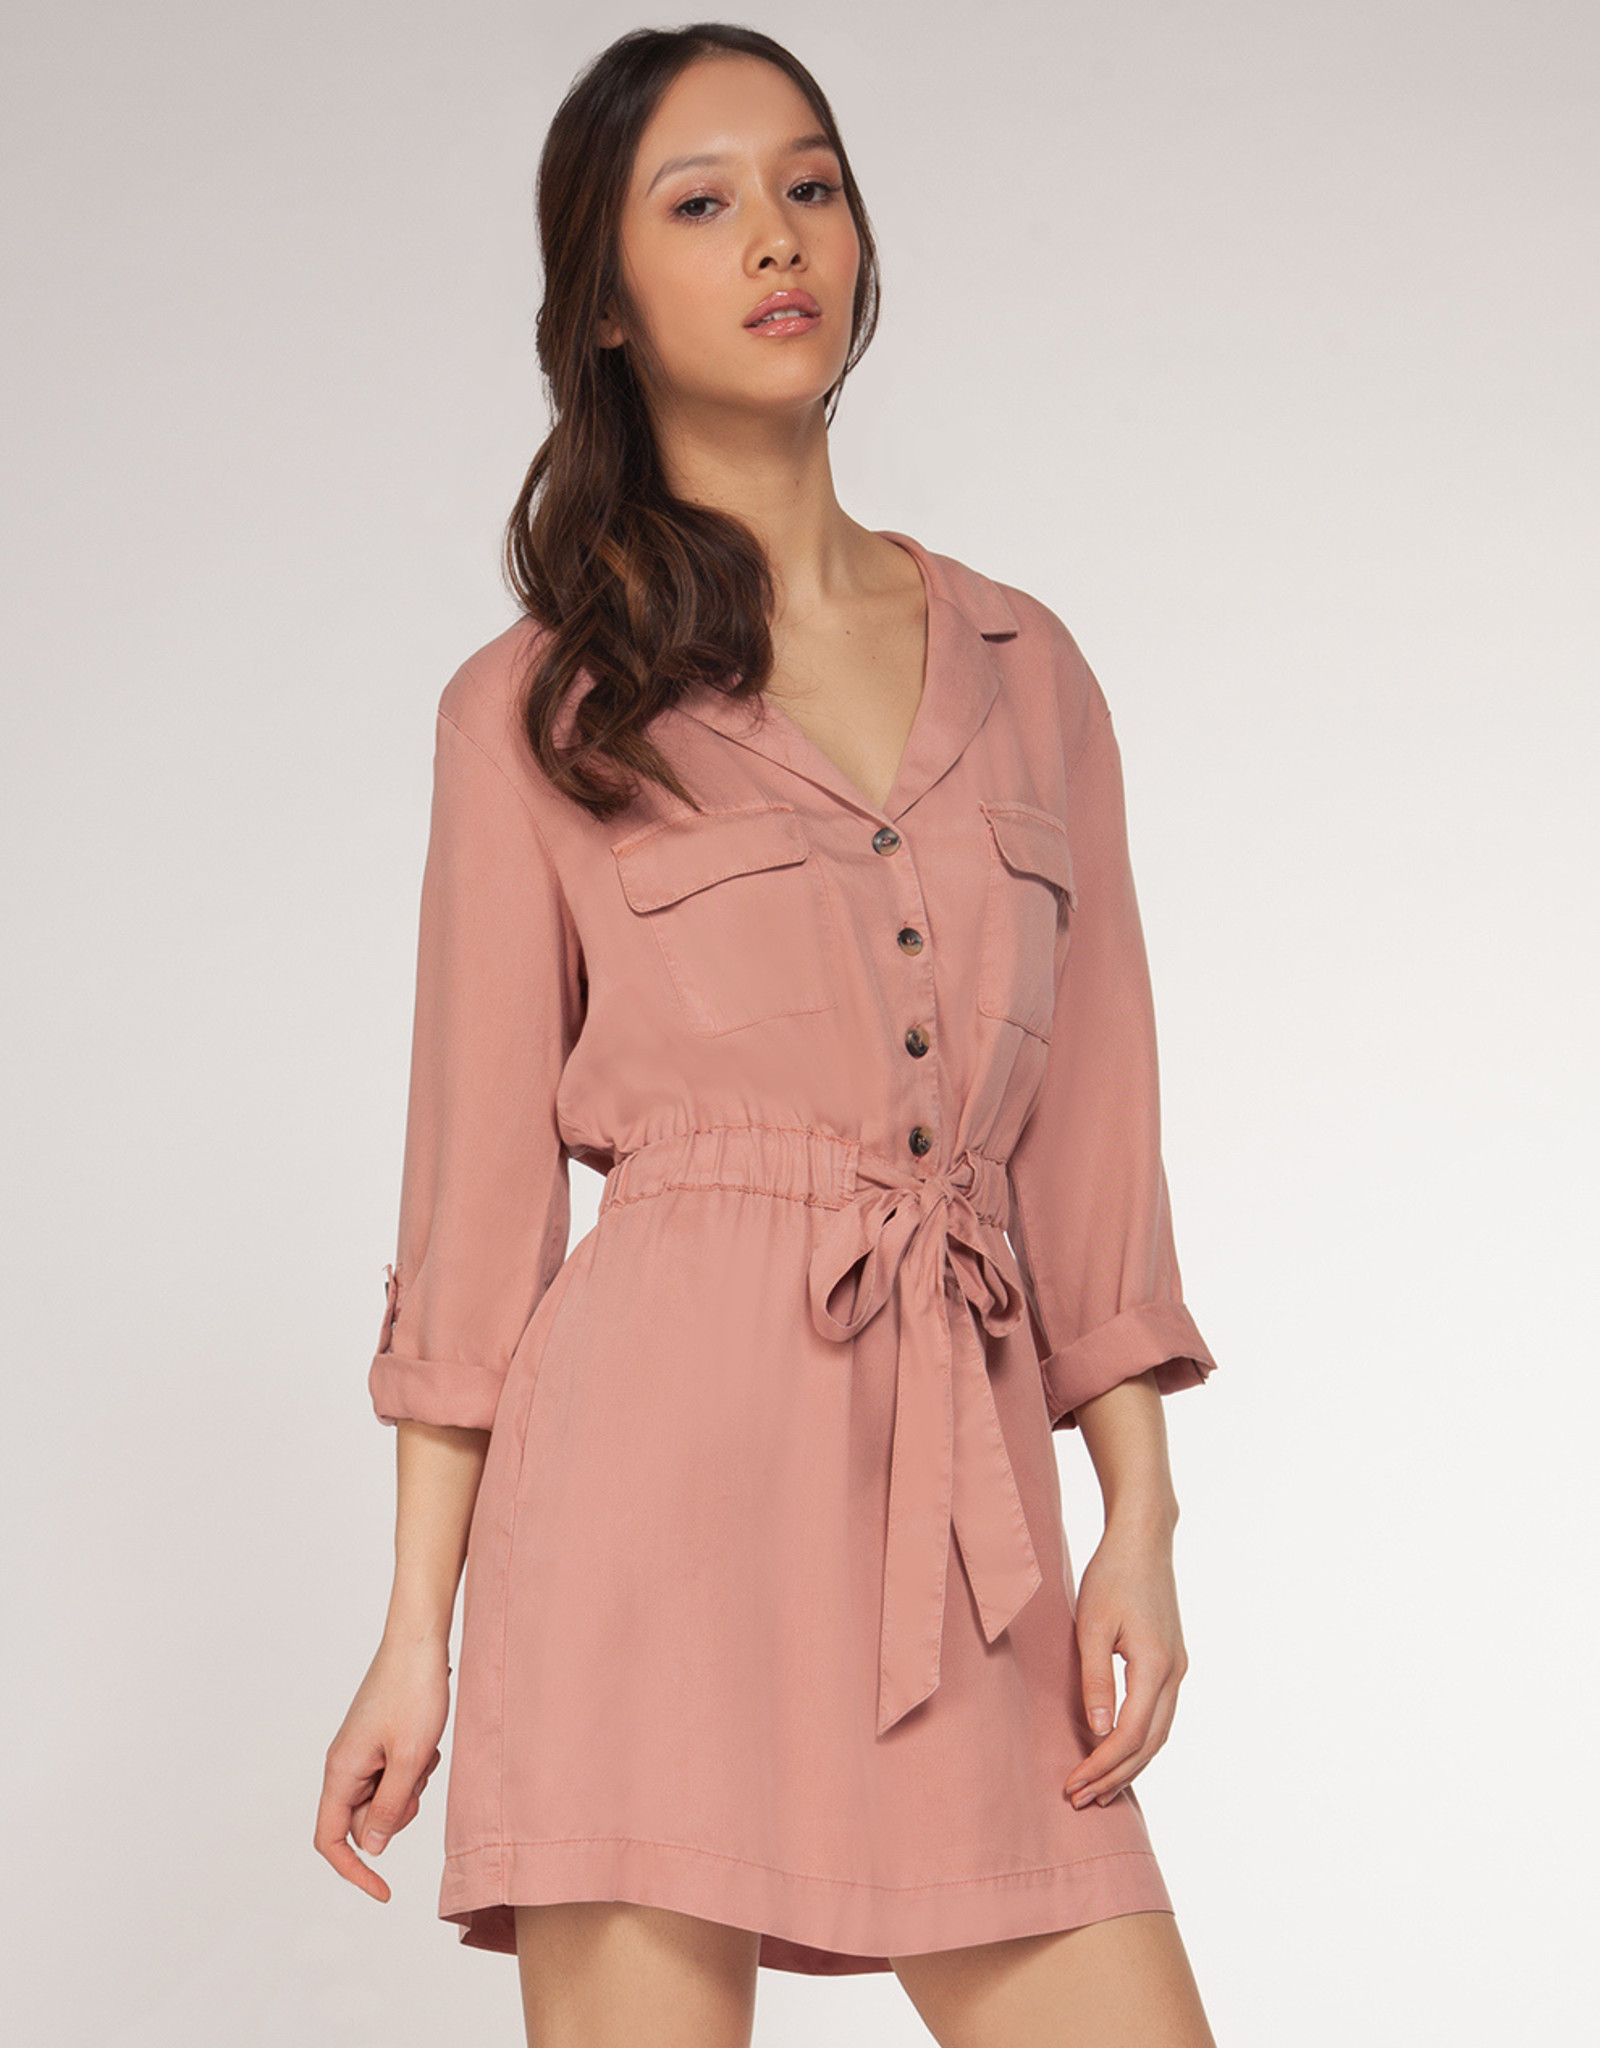 Dex Rose Shirt Dress